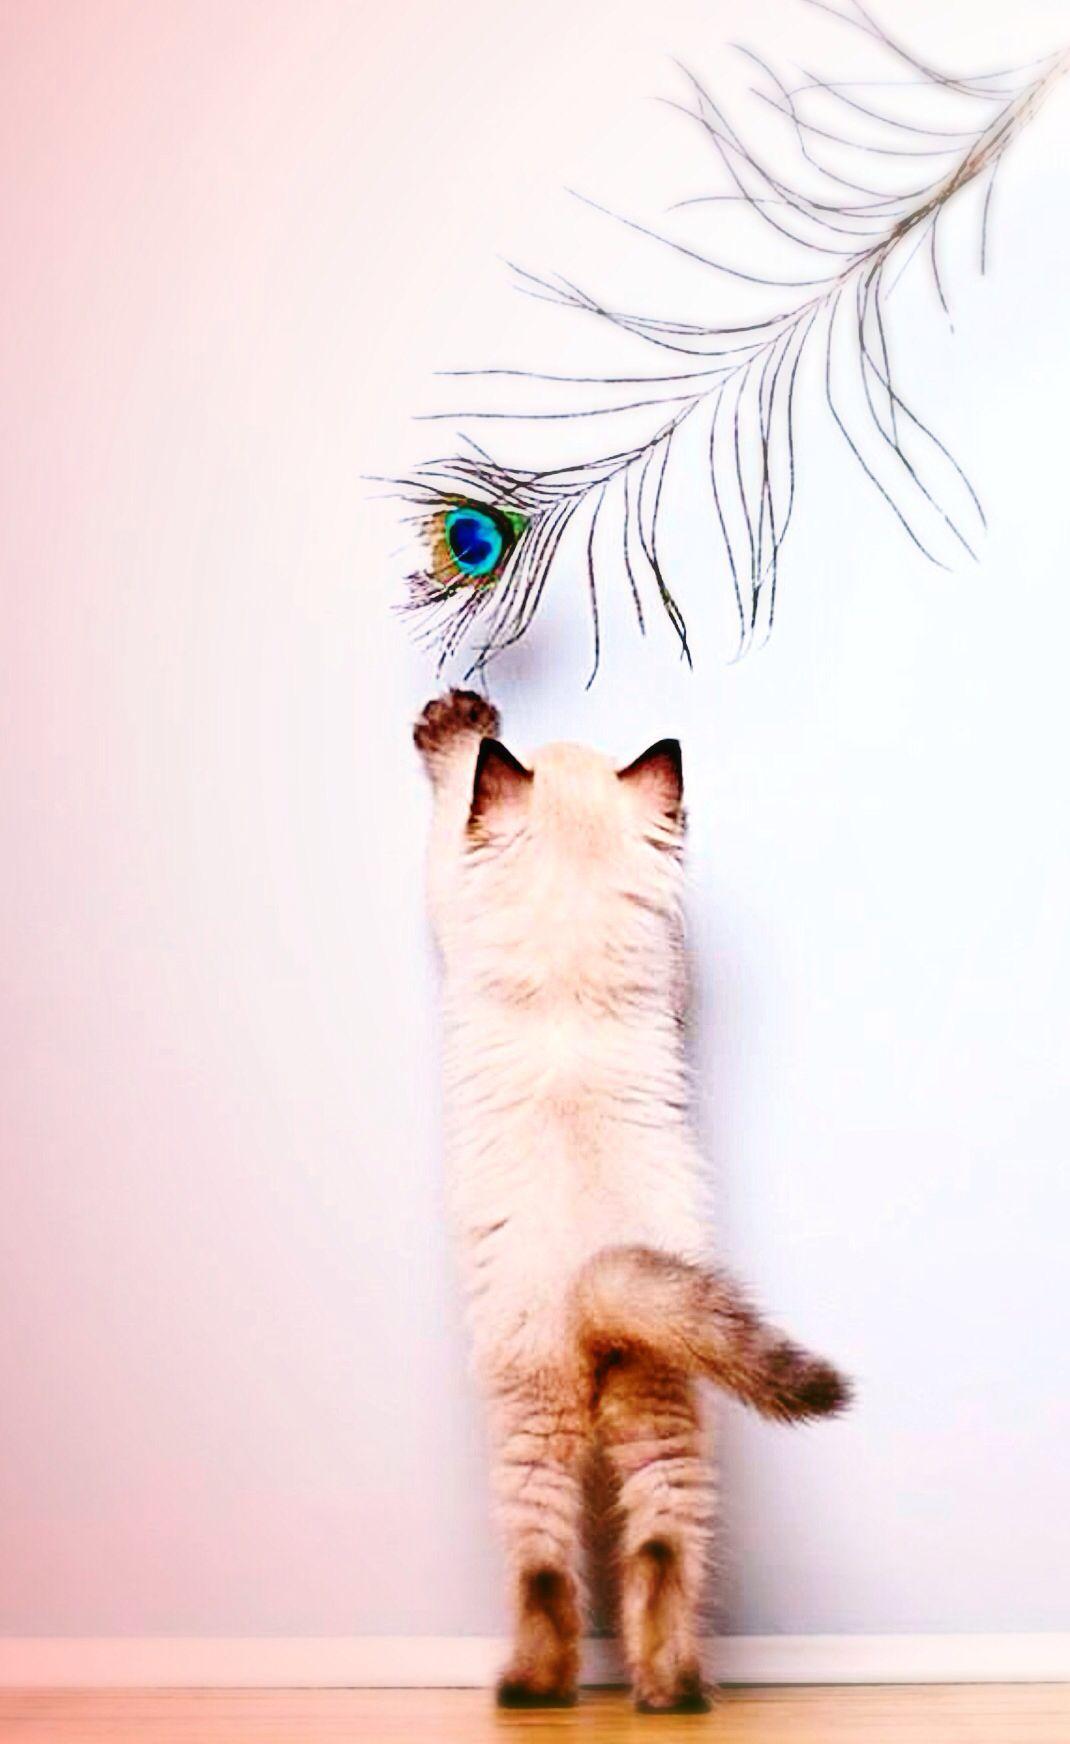 Aww… so cute! Kitten that I edited!